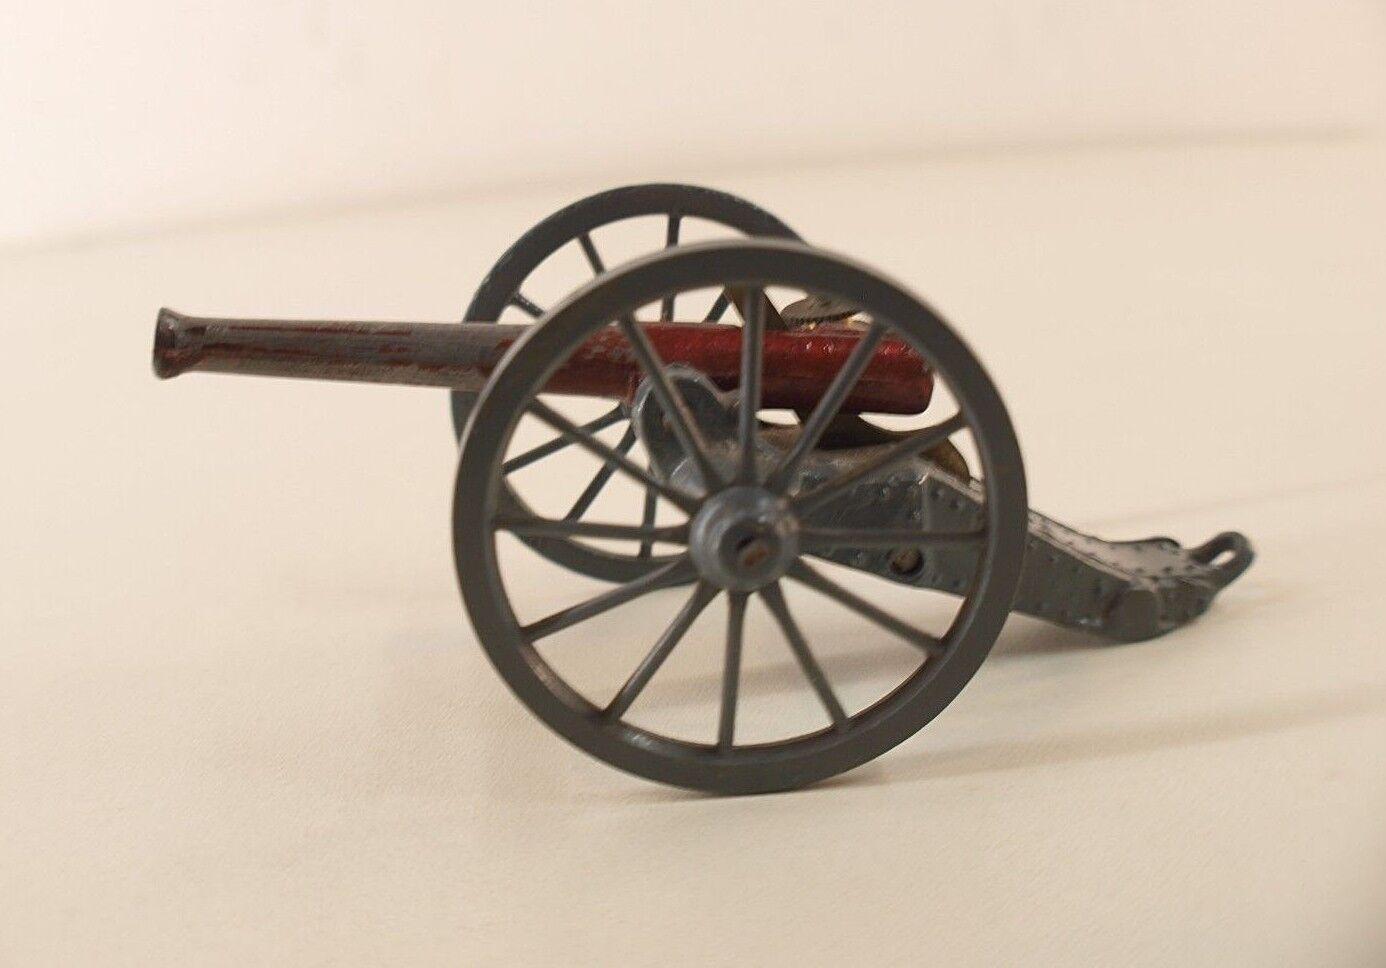 Vintage 1915 Britains Confederate  2058 Patent  1215 Toy Artillery Cannon canon